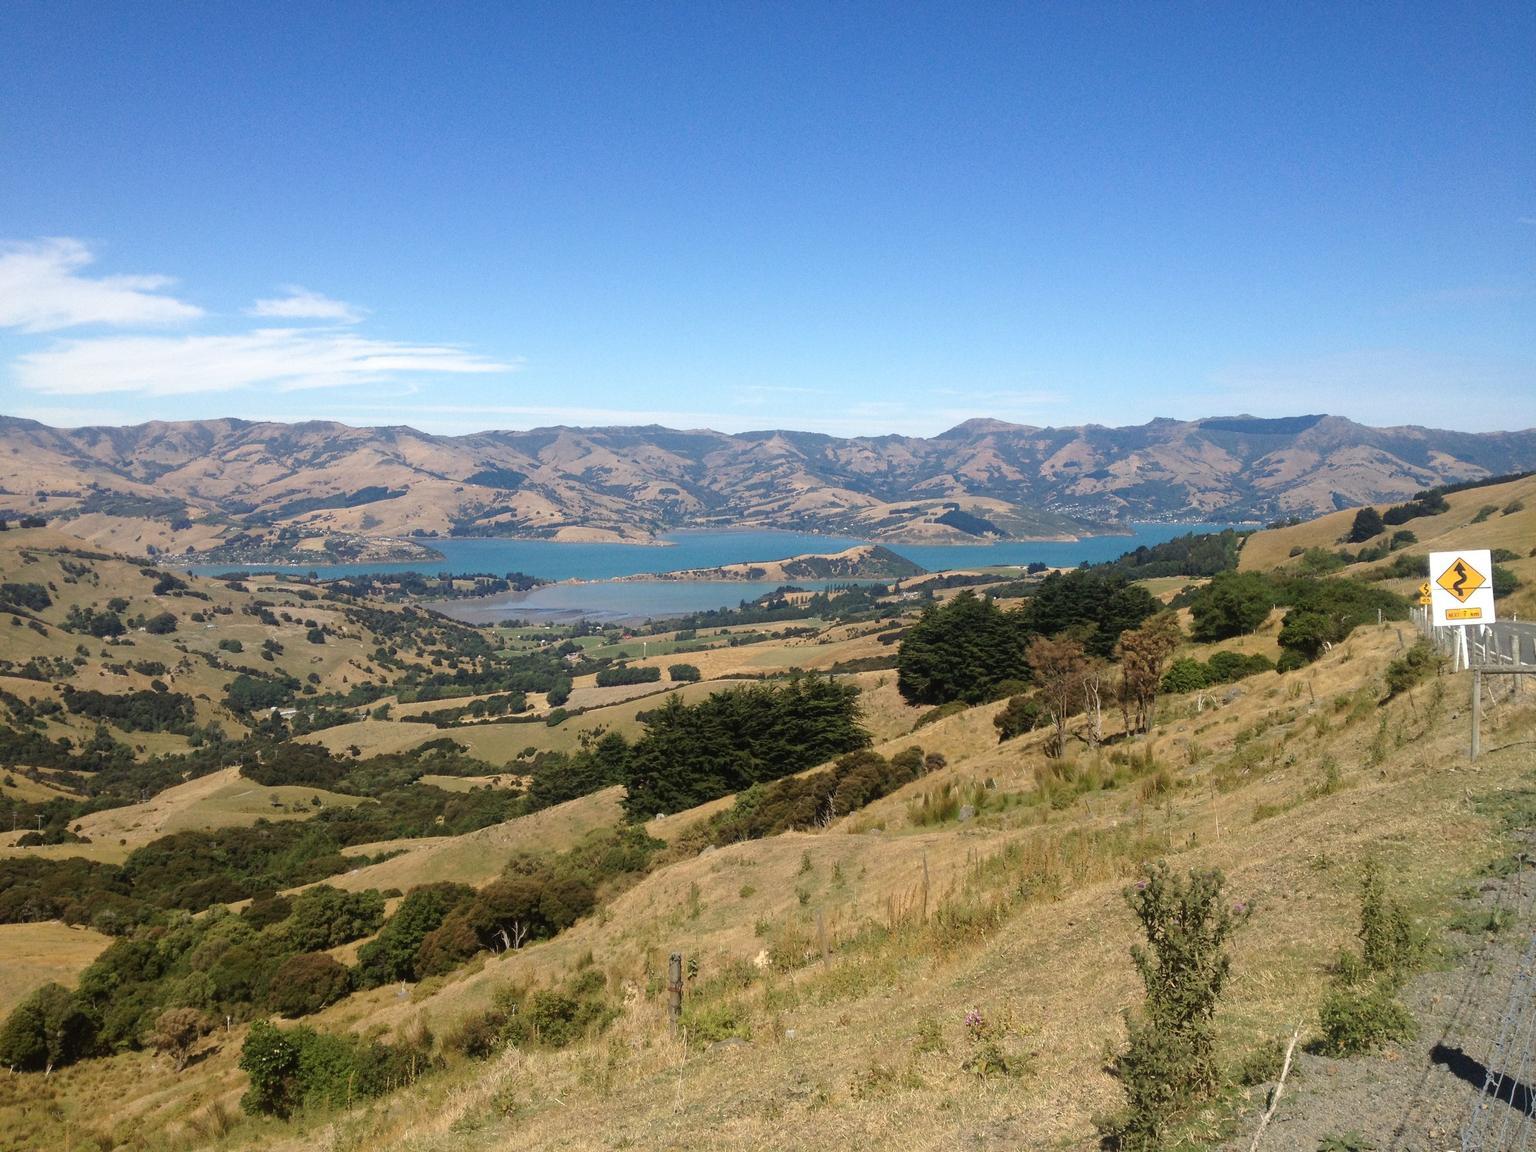 MÁS FOTOS, Akaroa Shore Excursion: Banks Peninsula, Christchurch City Tour and Jet Boat on Waimak River